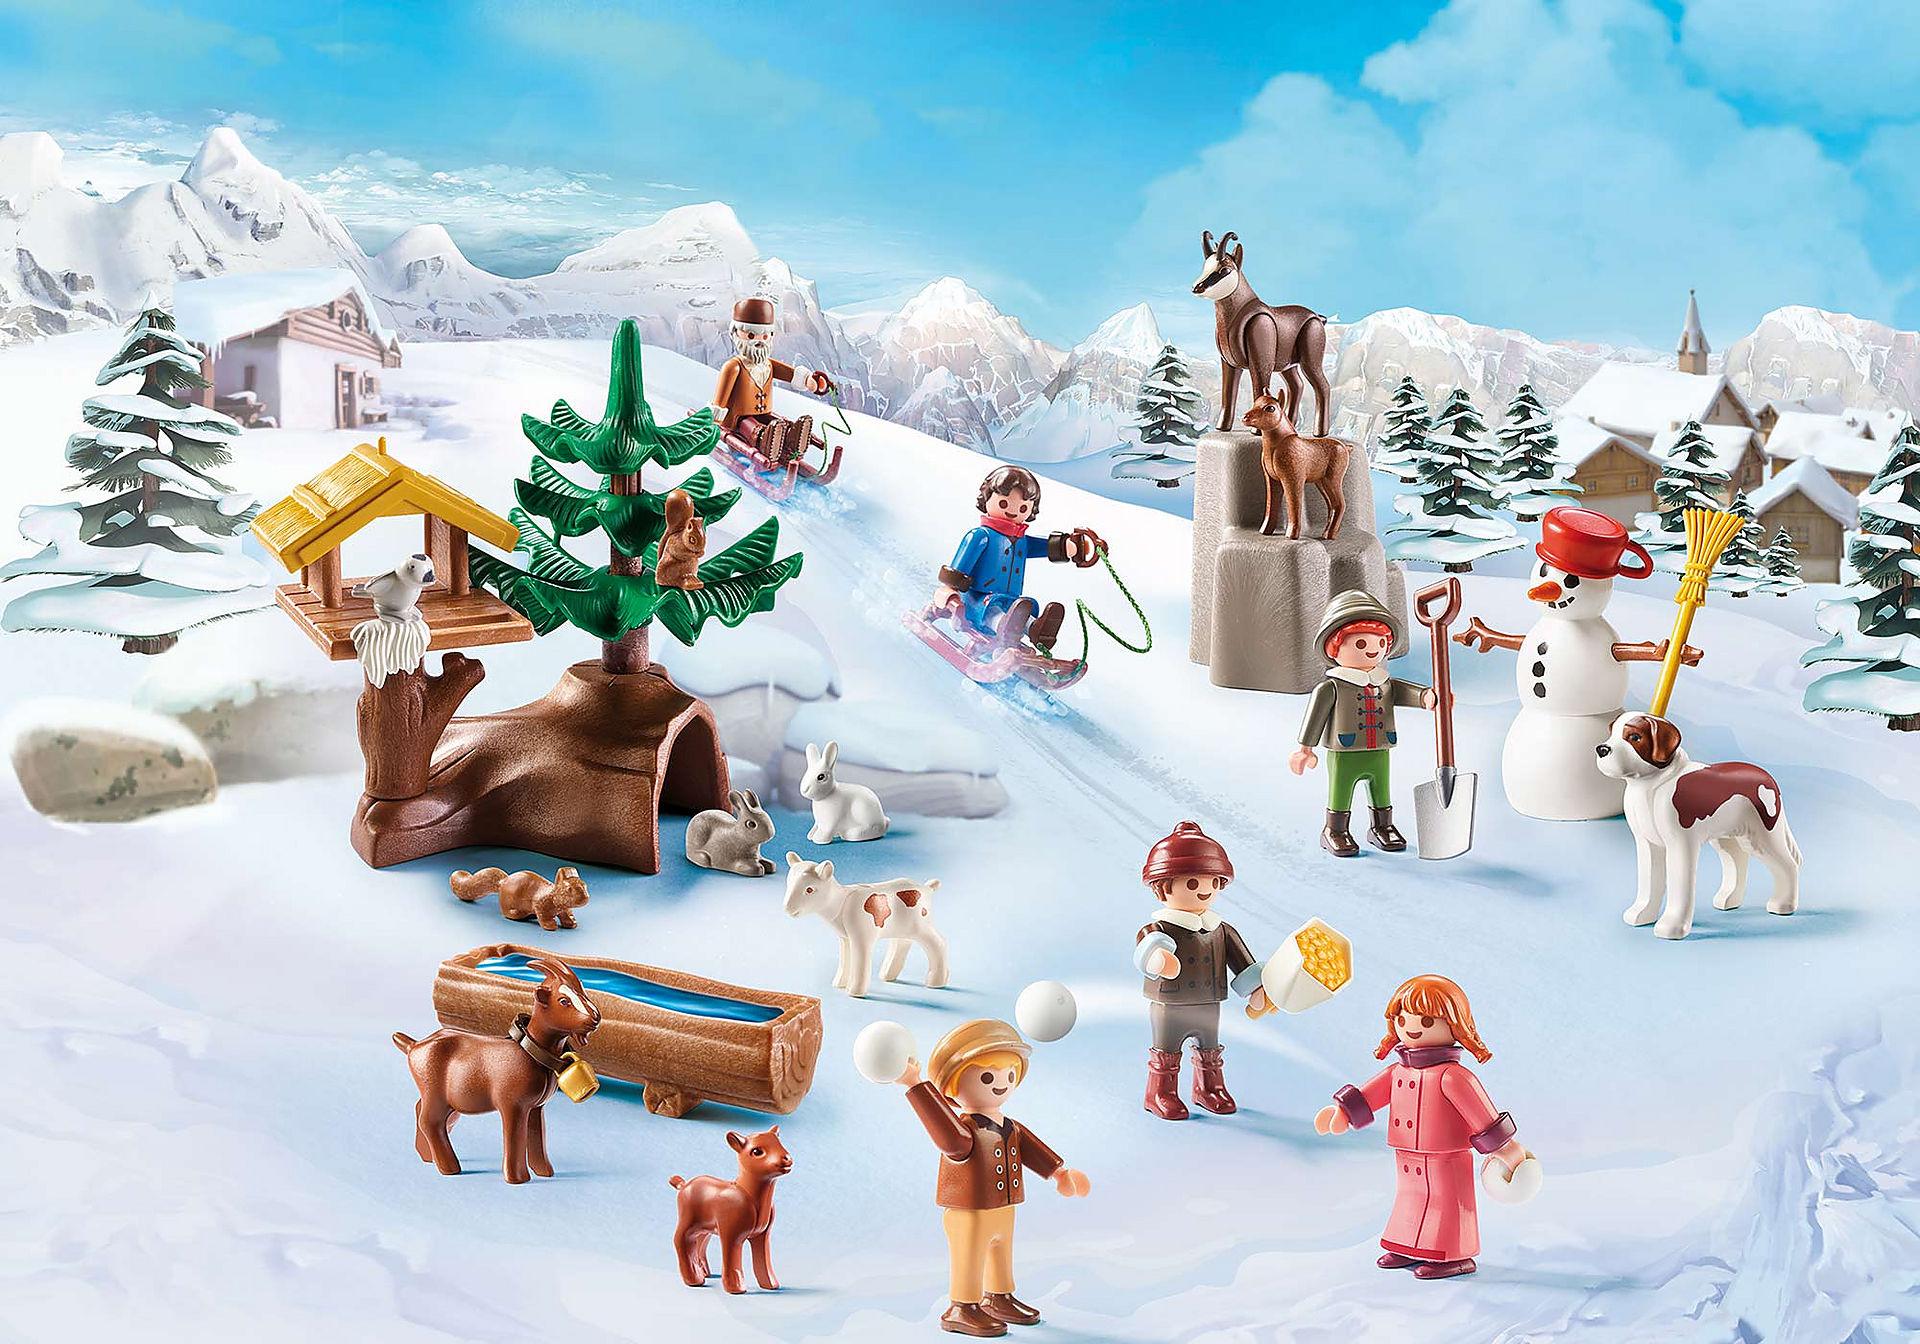 70260 Advent Calendar - Heidi's Winter World zoom image5